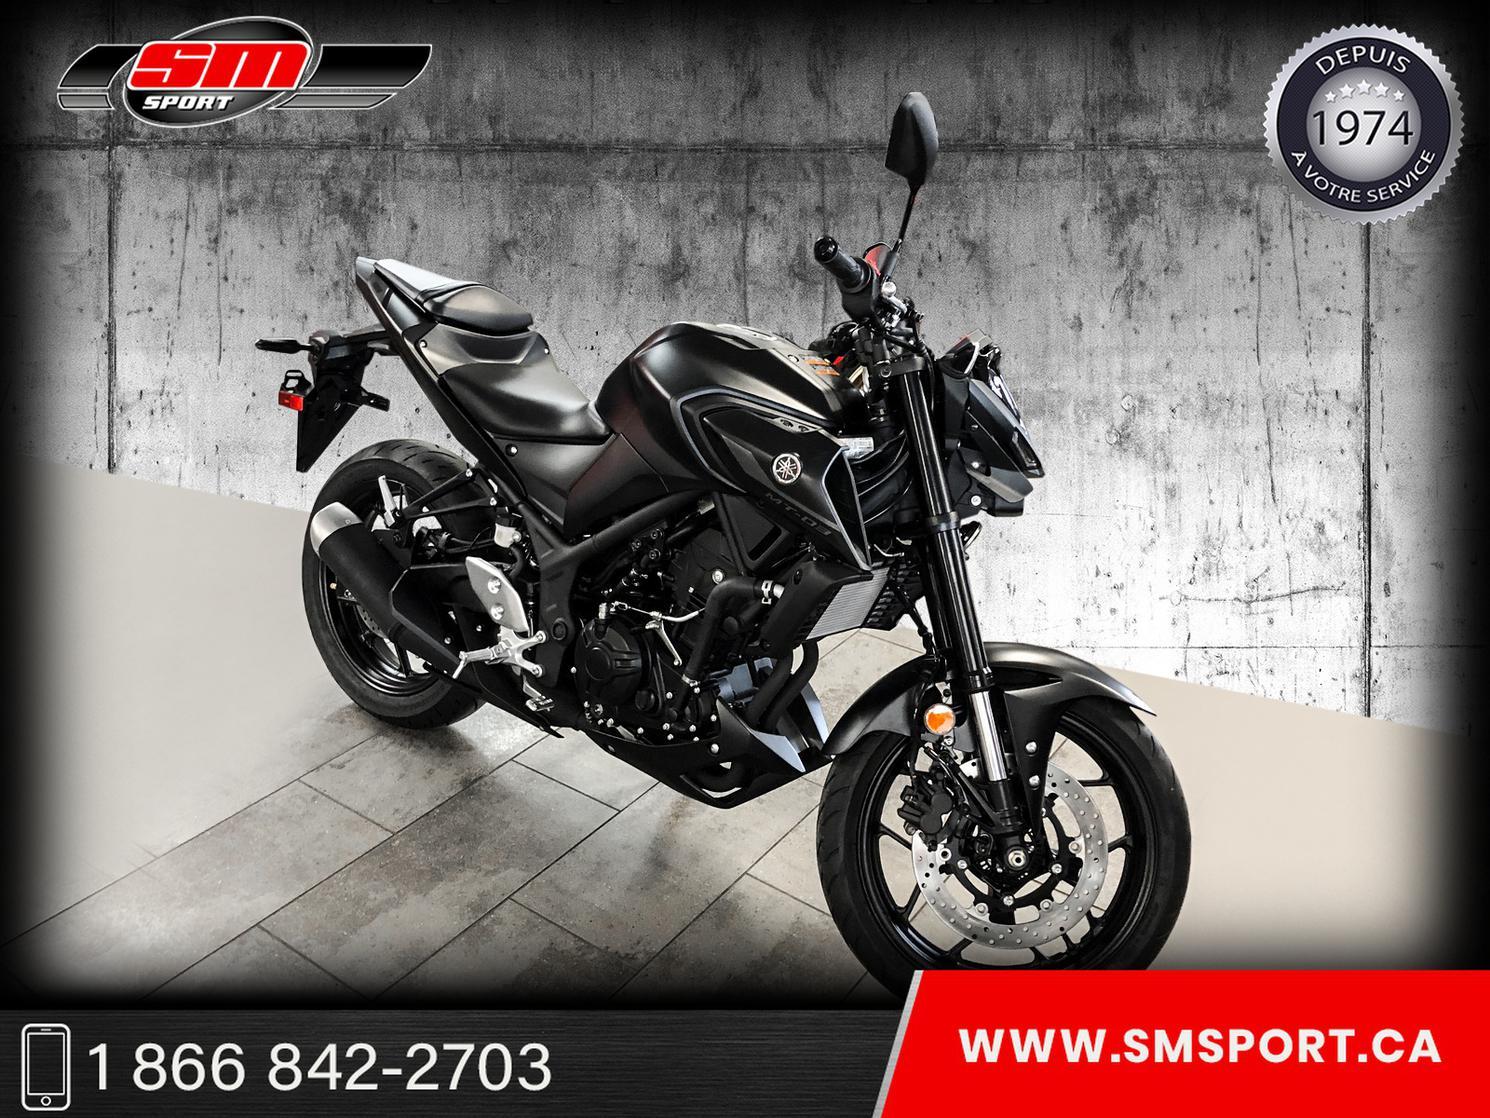 2021 Yamaha MT-03 - NEUVE DISPONIBLE EN STOCK